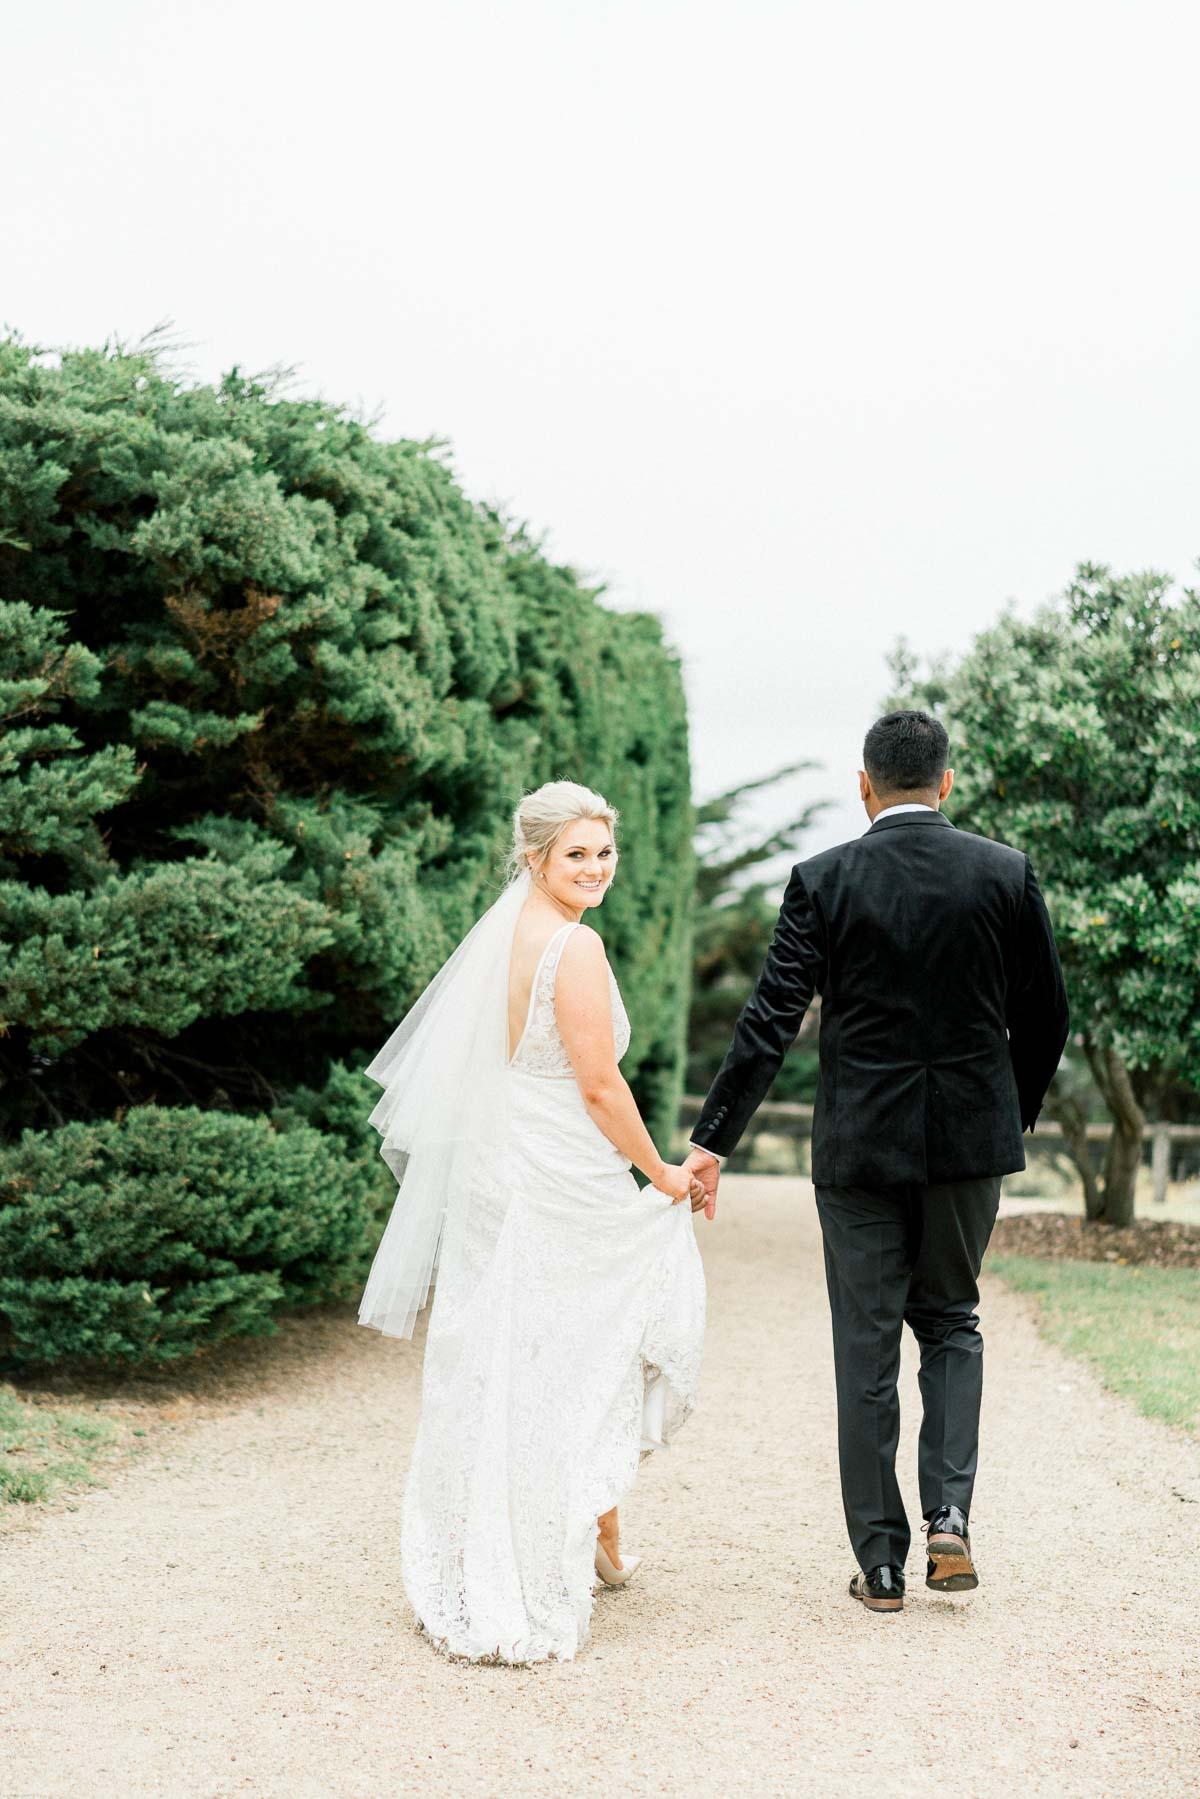 trenavin-chapel-phillip-island-wedding-heart+soul-weddings-sally-sean-01367.jpg